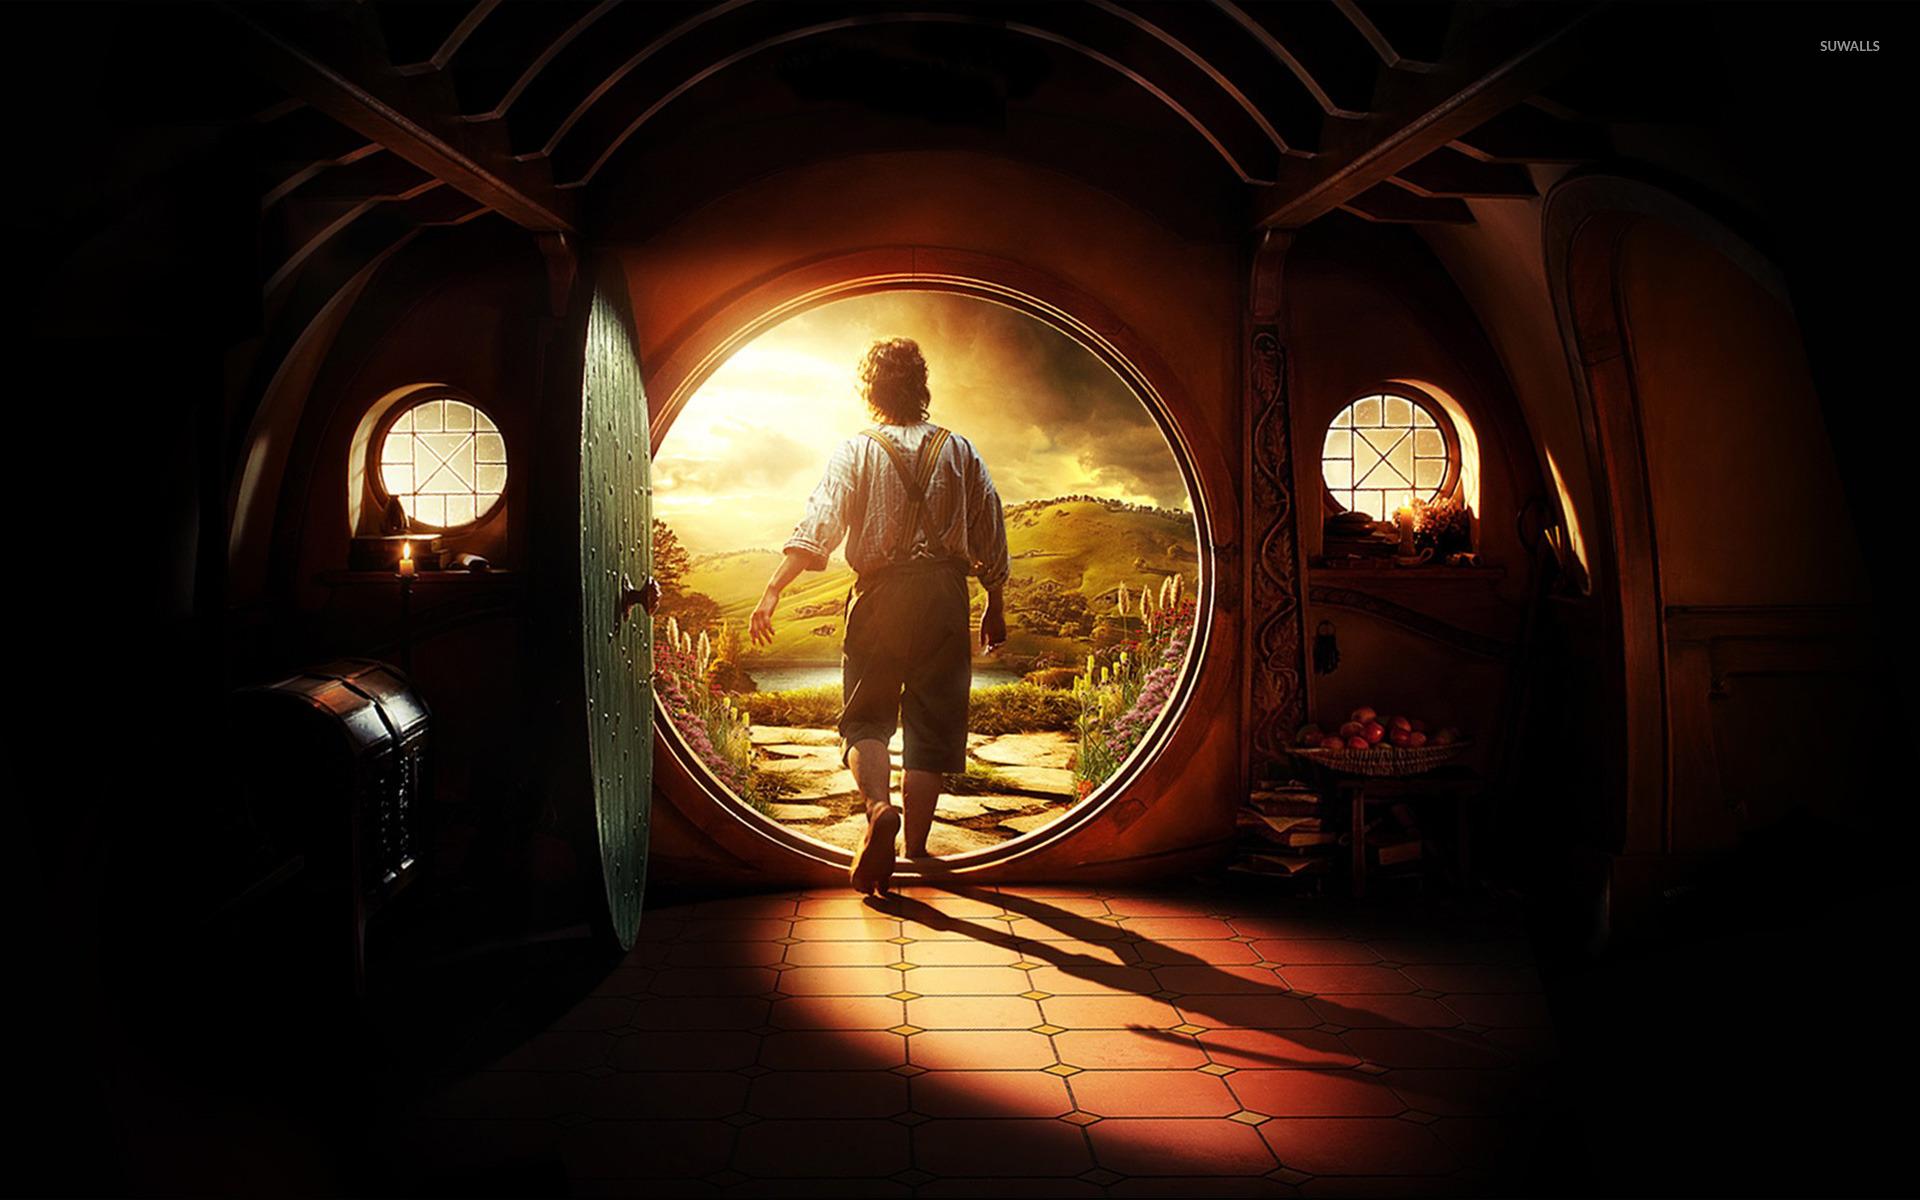 The Hobbit wallpaper   Movie wallpapers   11462 1920x1200